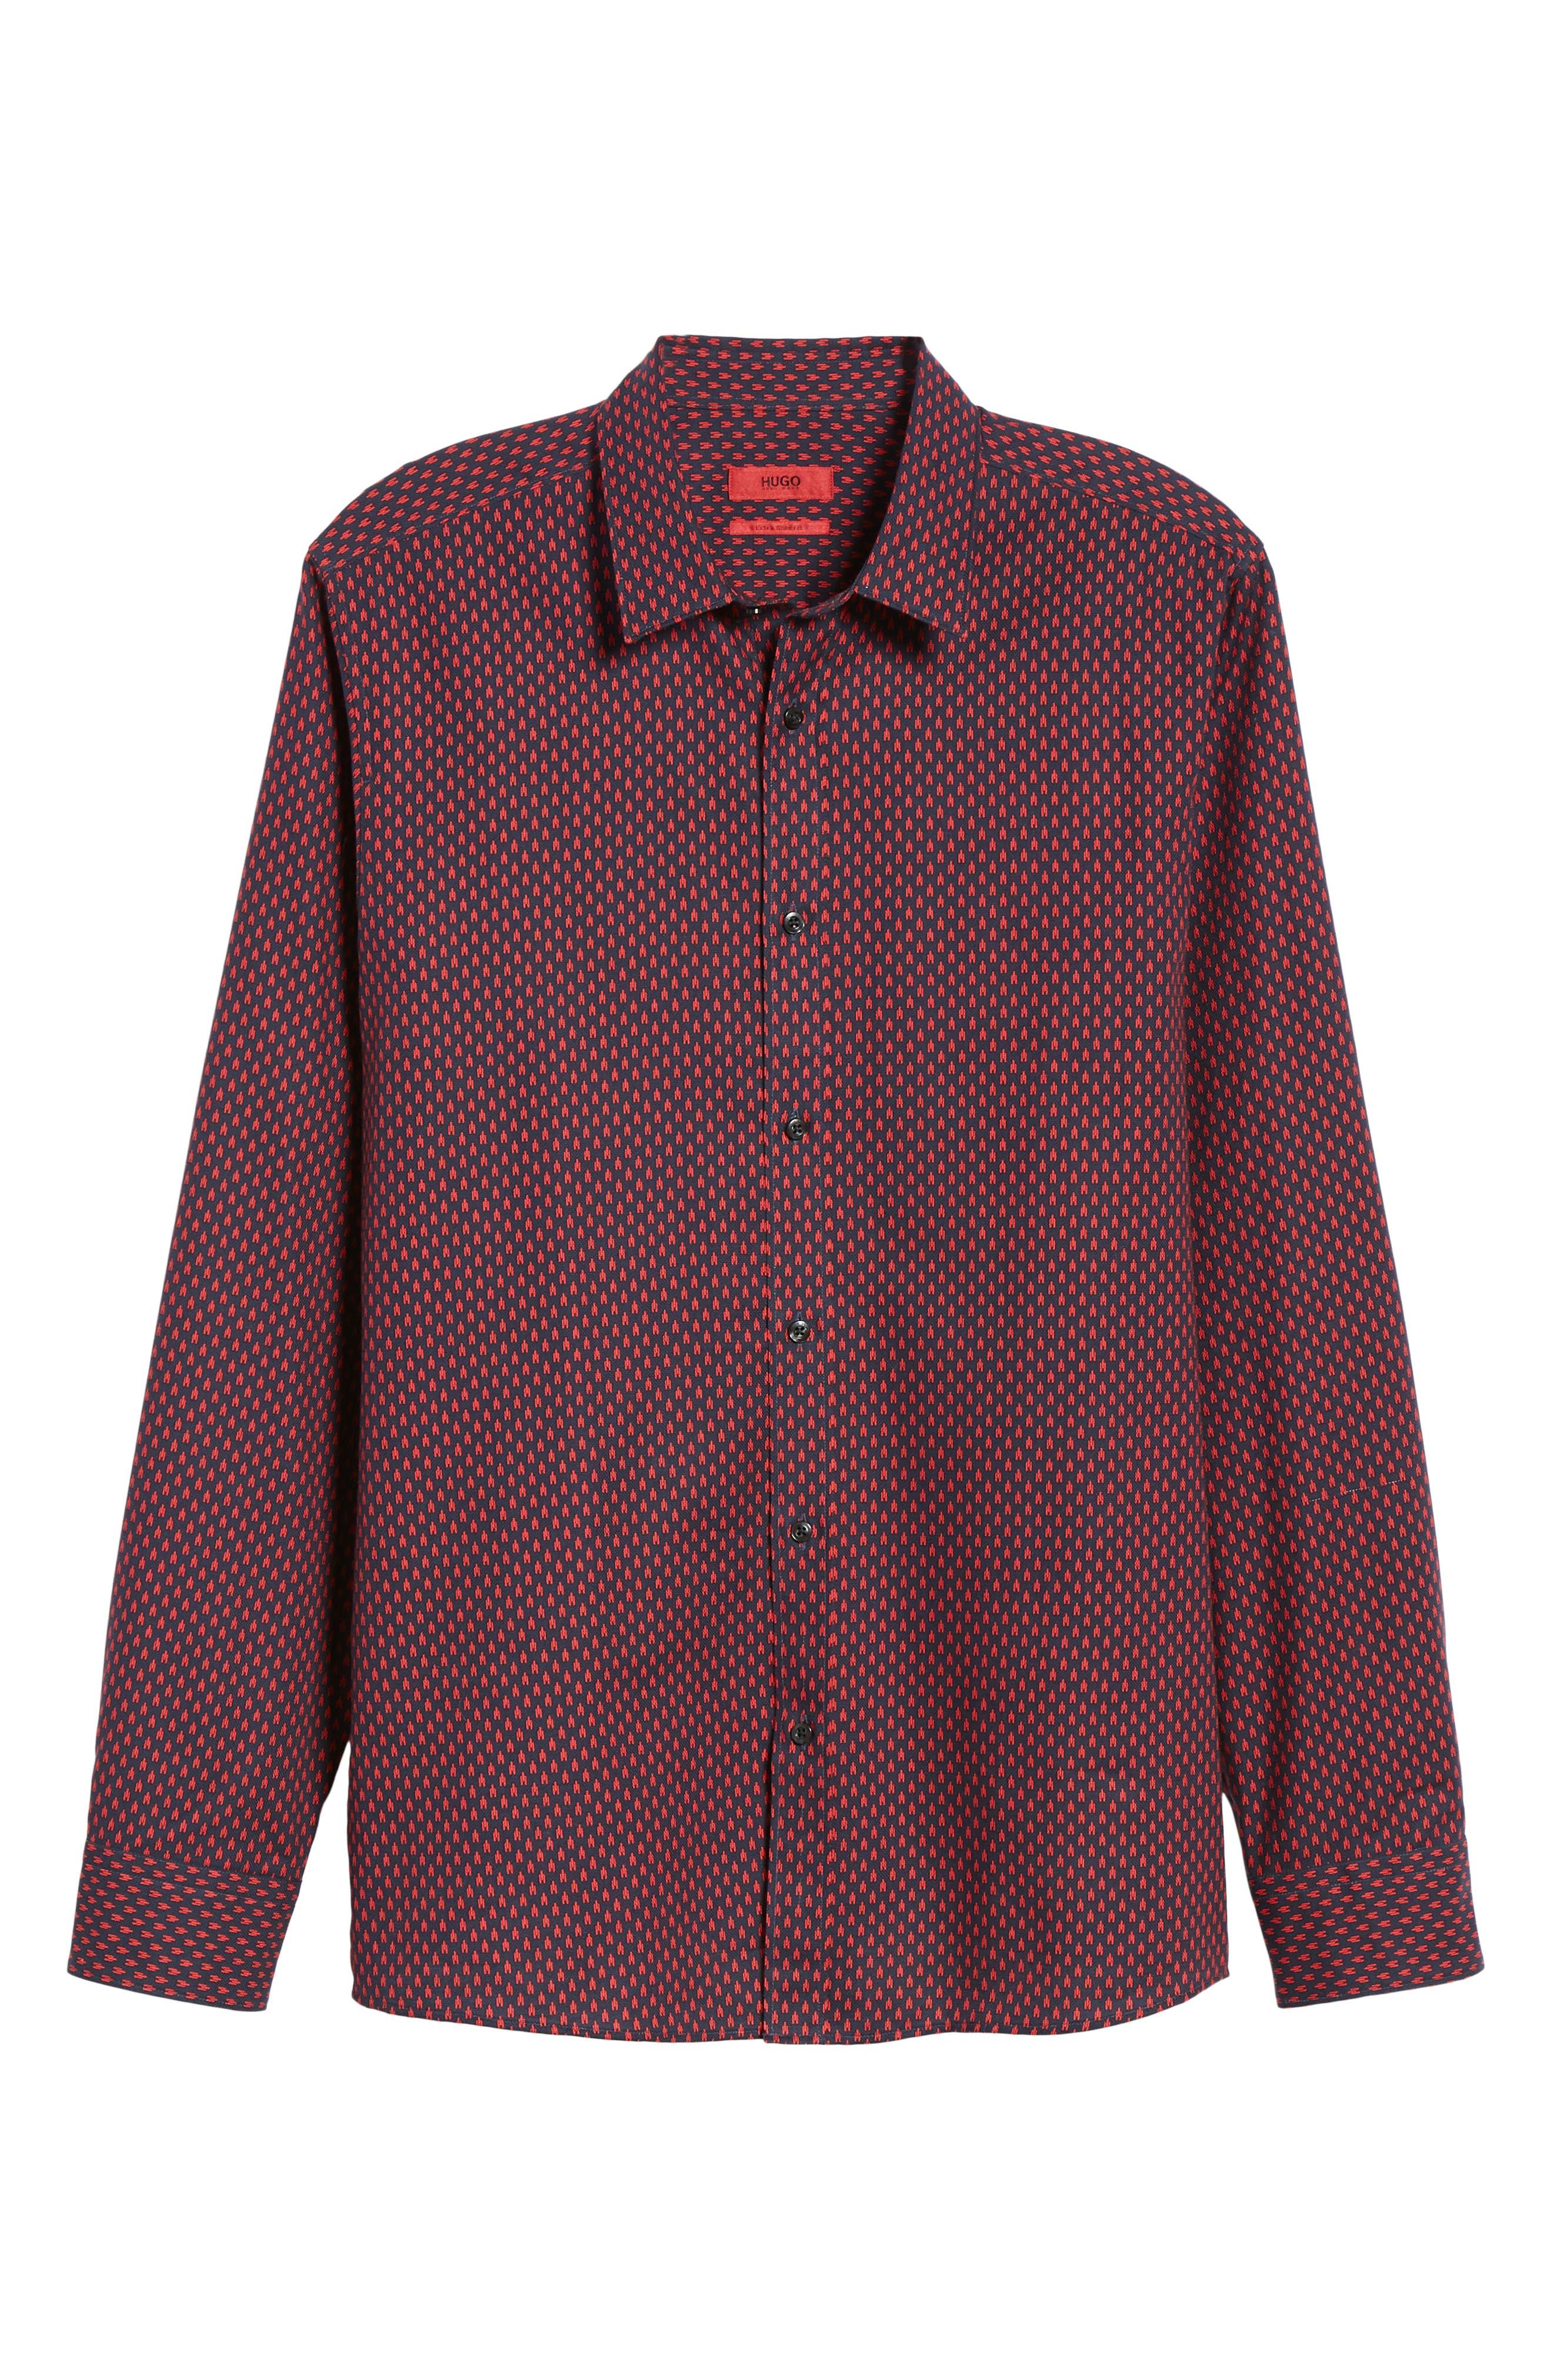 Elisha Extra Slim Fit Microprint Sport Shirt,                             Alternate thumbnail 5, color,                             622